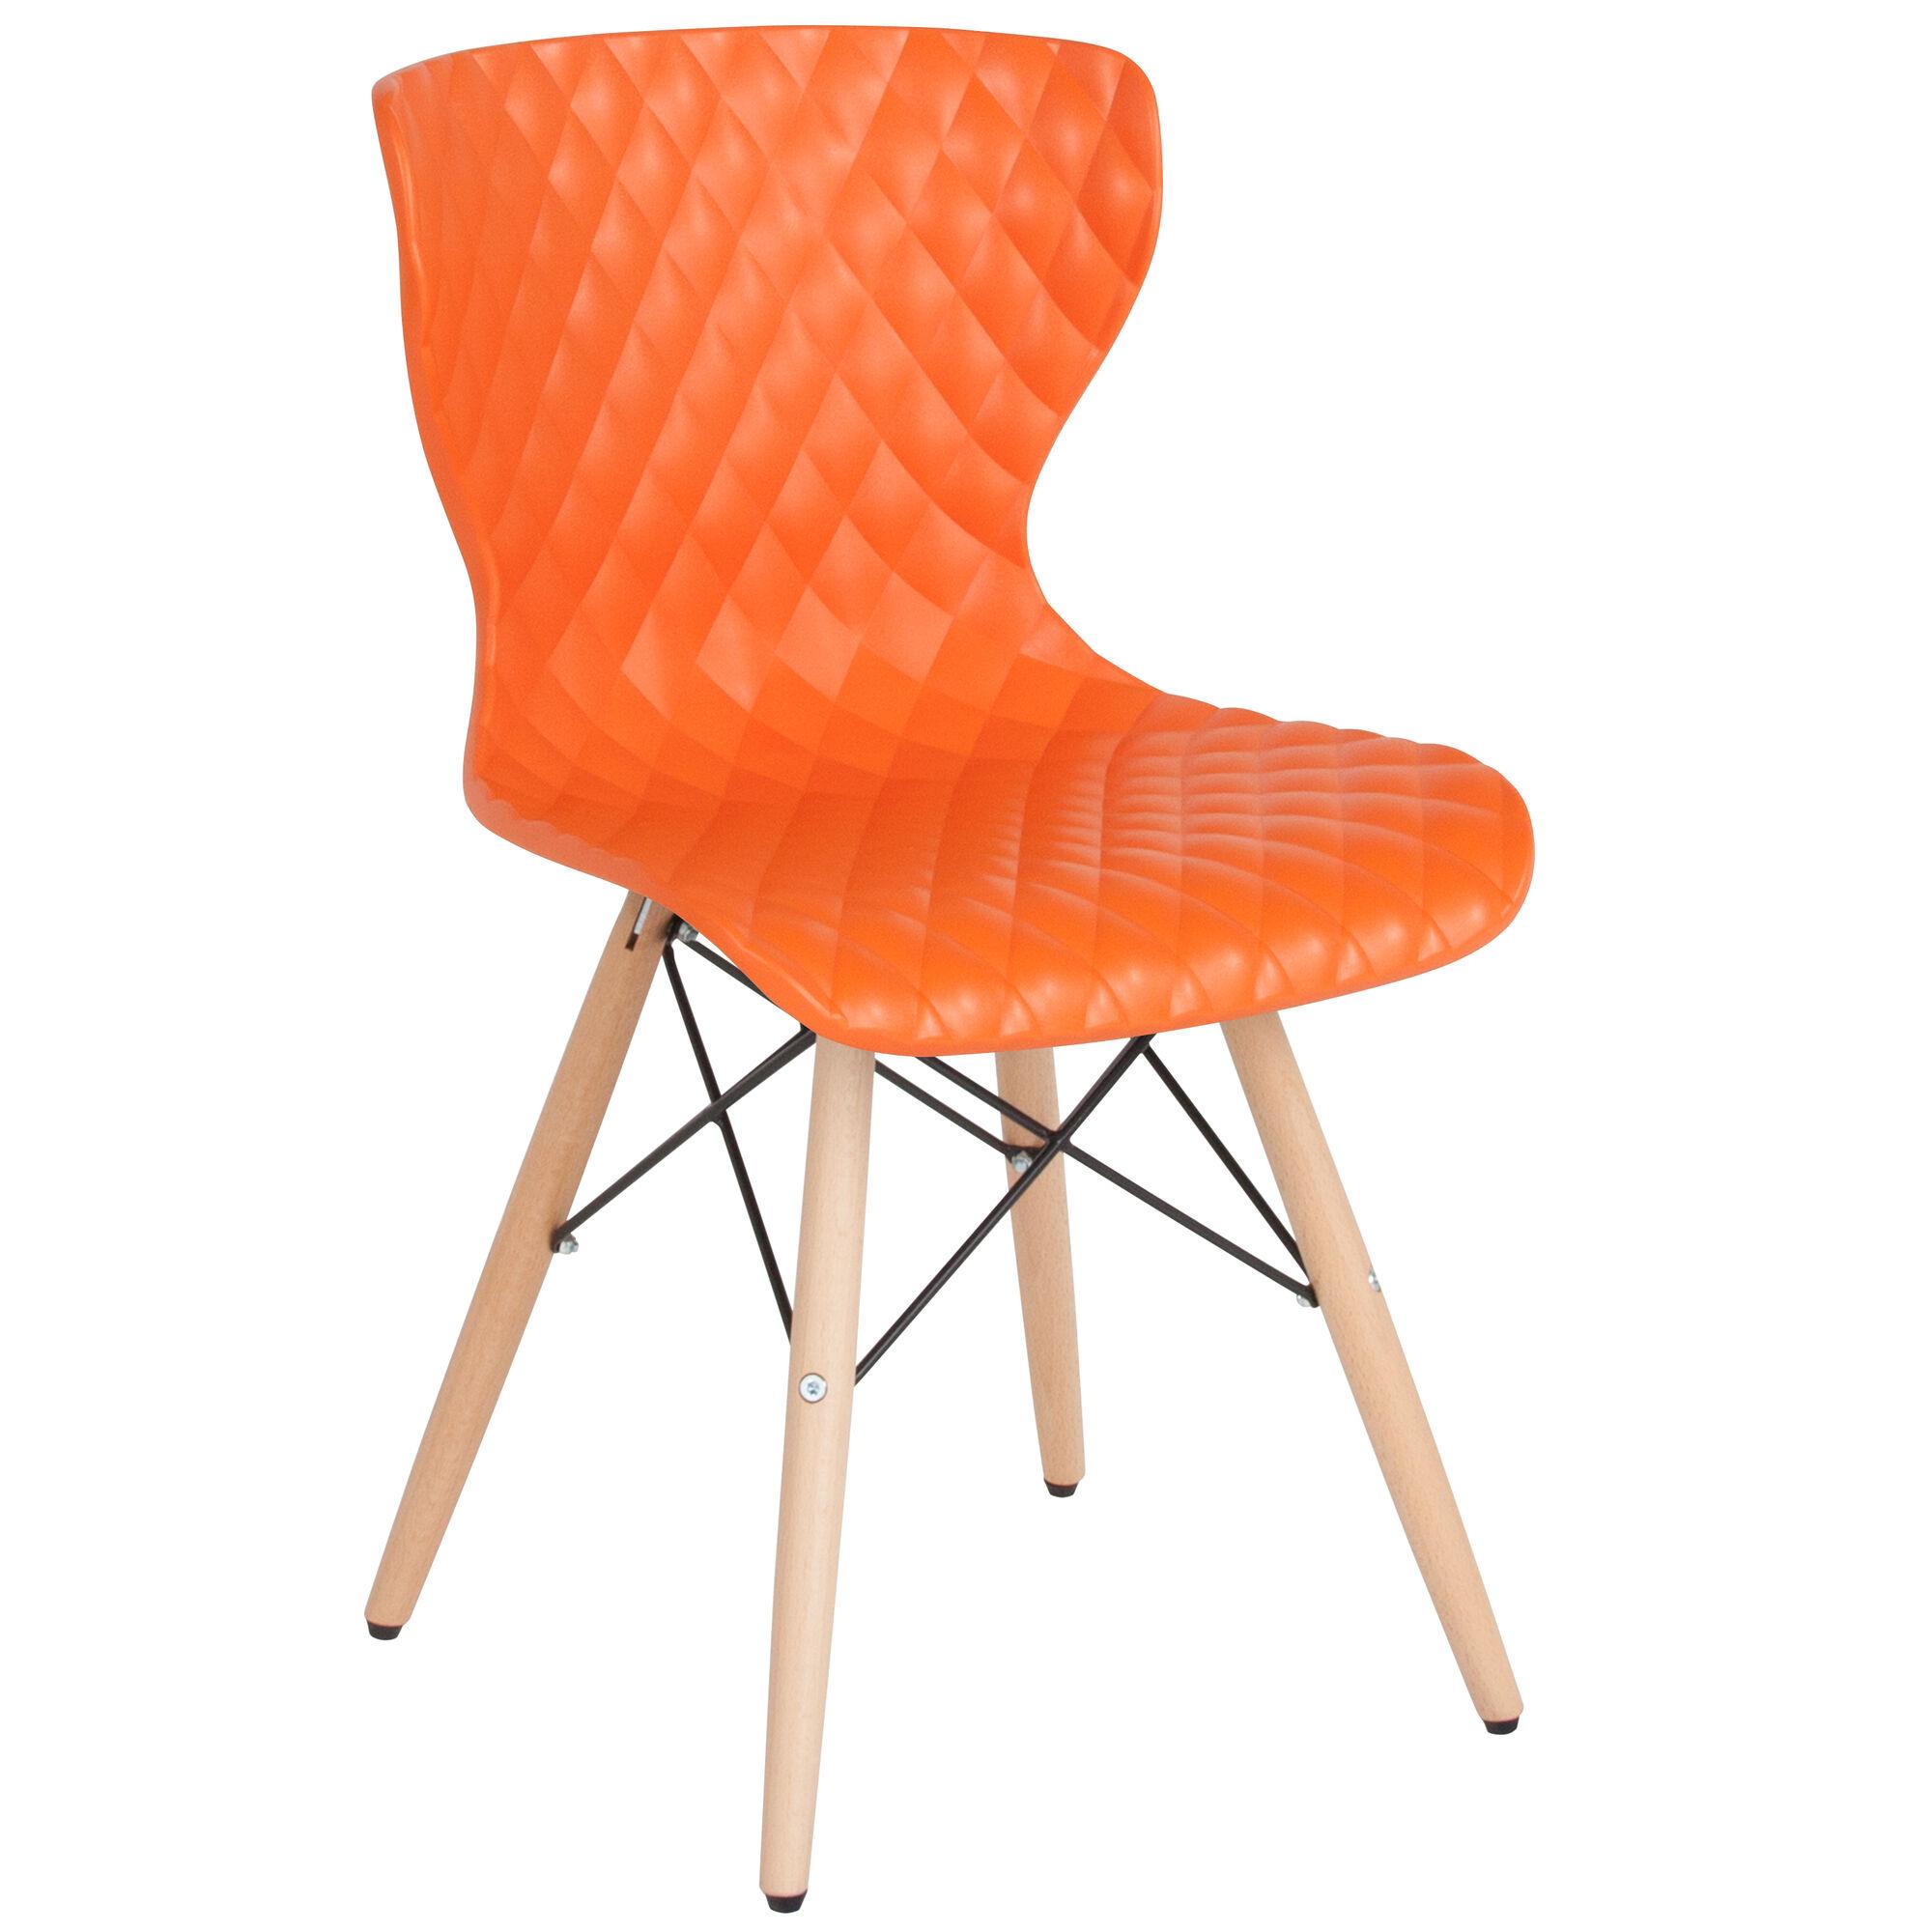 Astounding Bedford Contemporary Design Orange Plastic Chair With Wooden Legs Ibusinesslaw Wood Chair Design Ideas Ibusinesslaworg